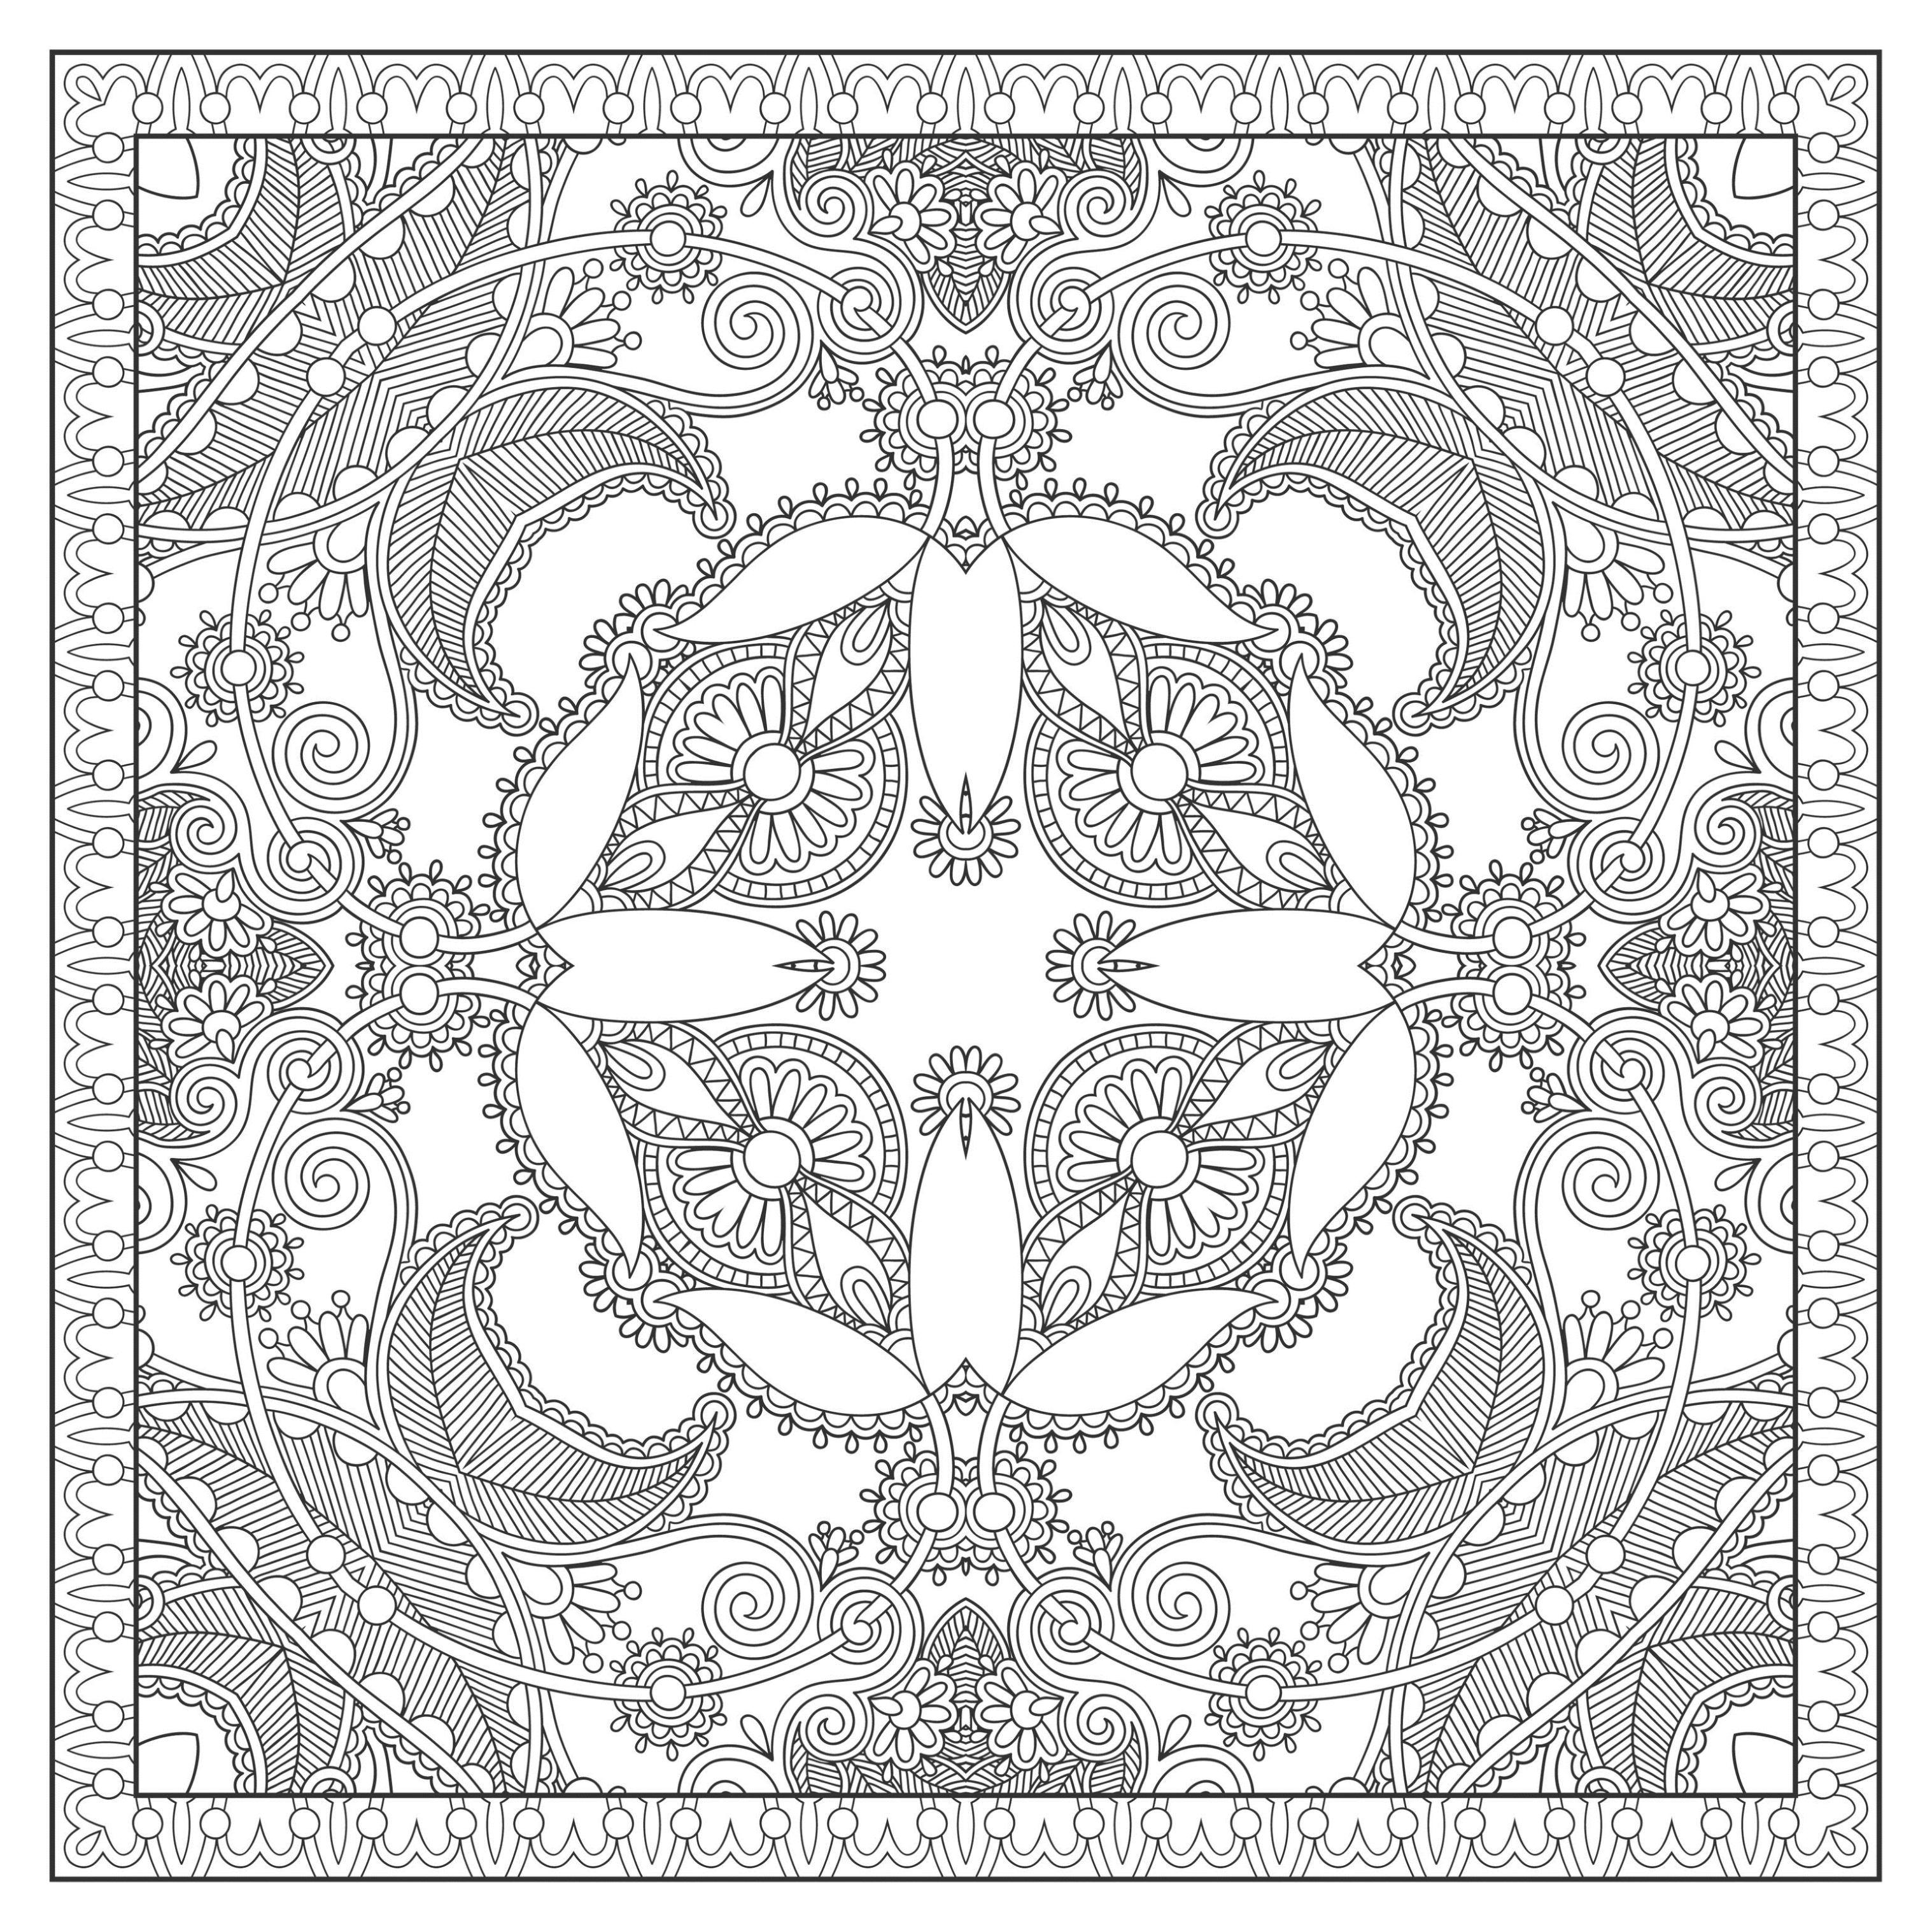 A beautiful square Mandala by Lesya Kara-Kotsya